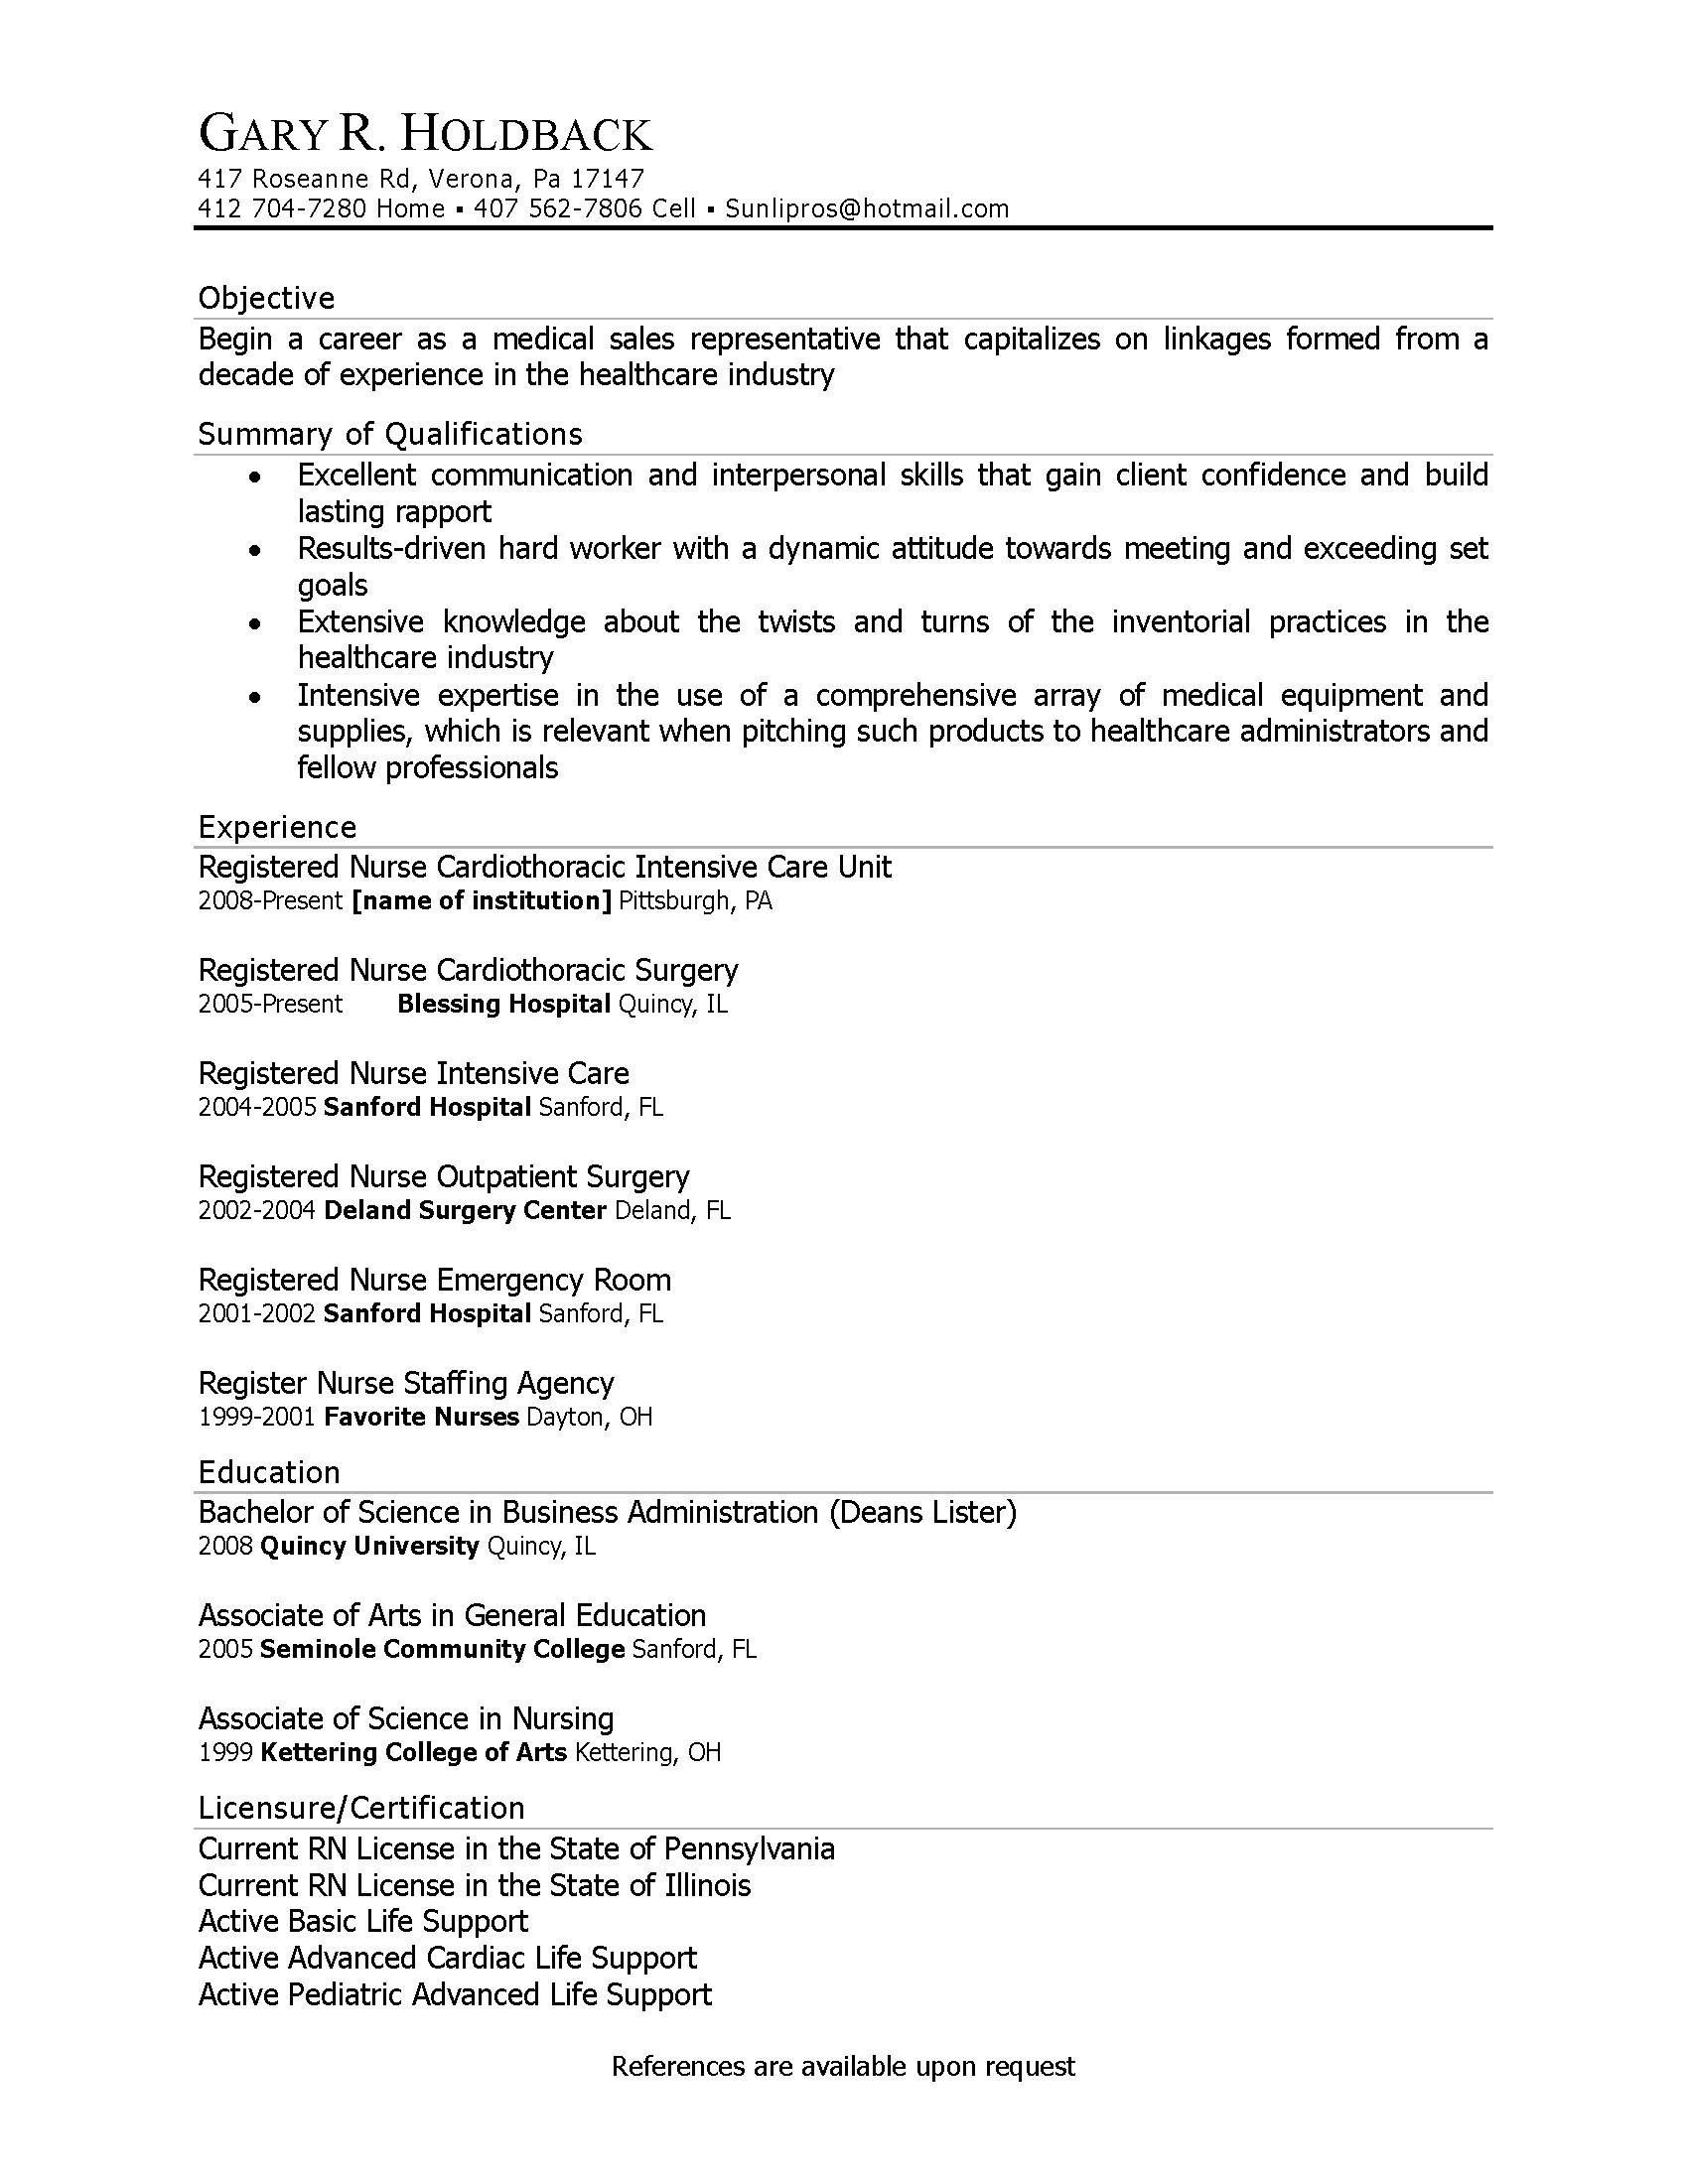 Resume Profile Examples Career Change